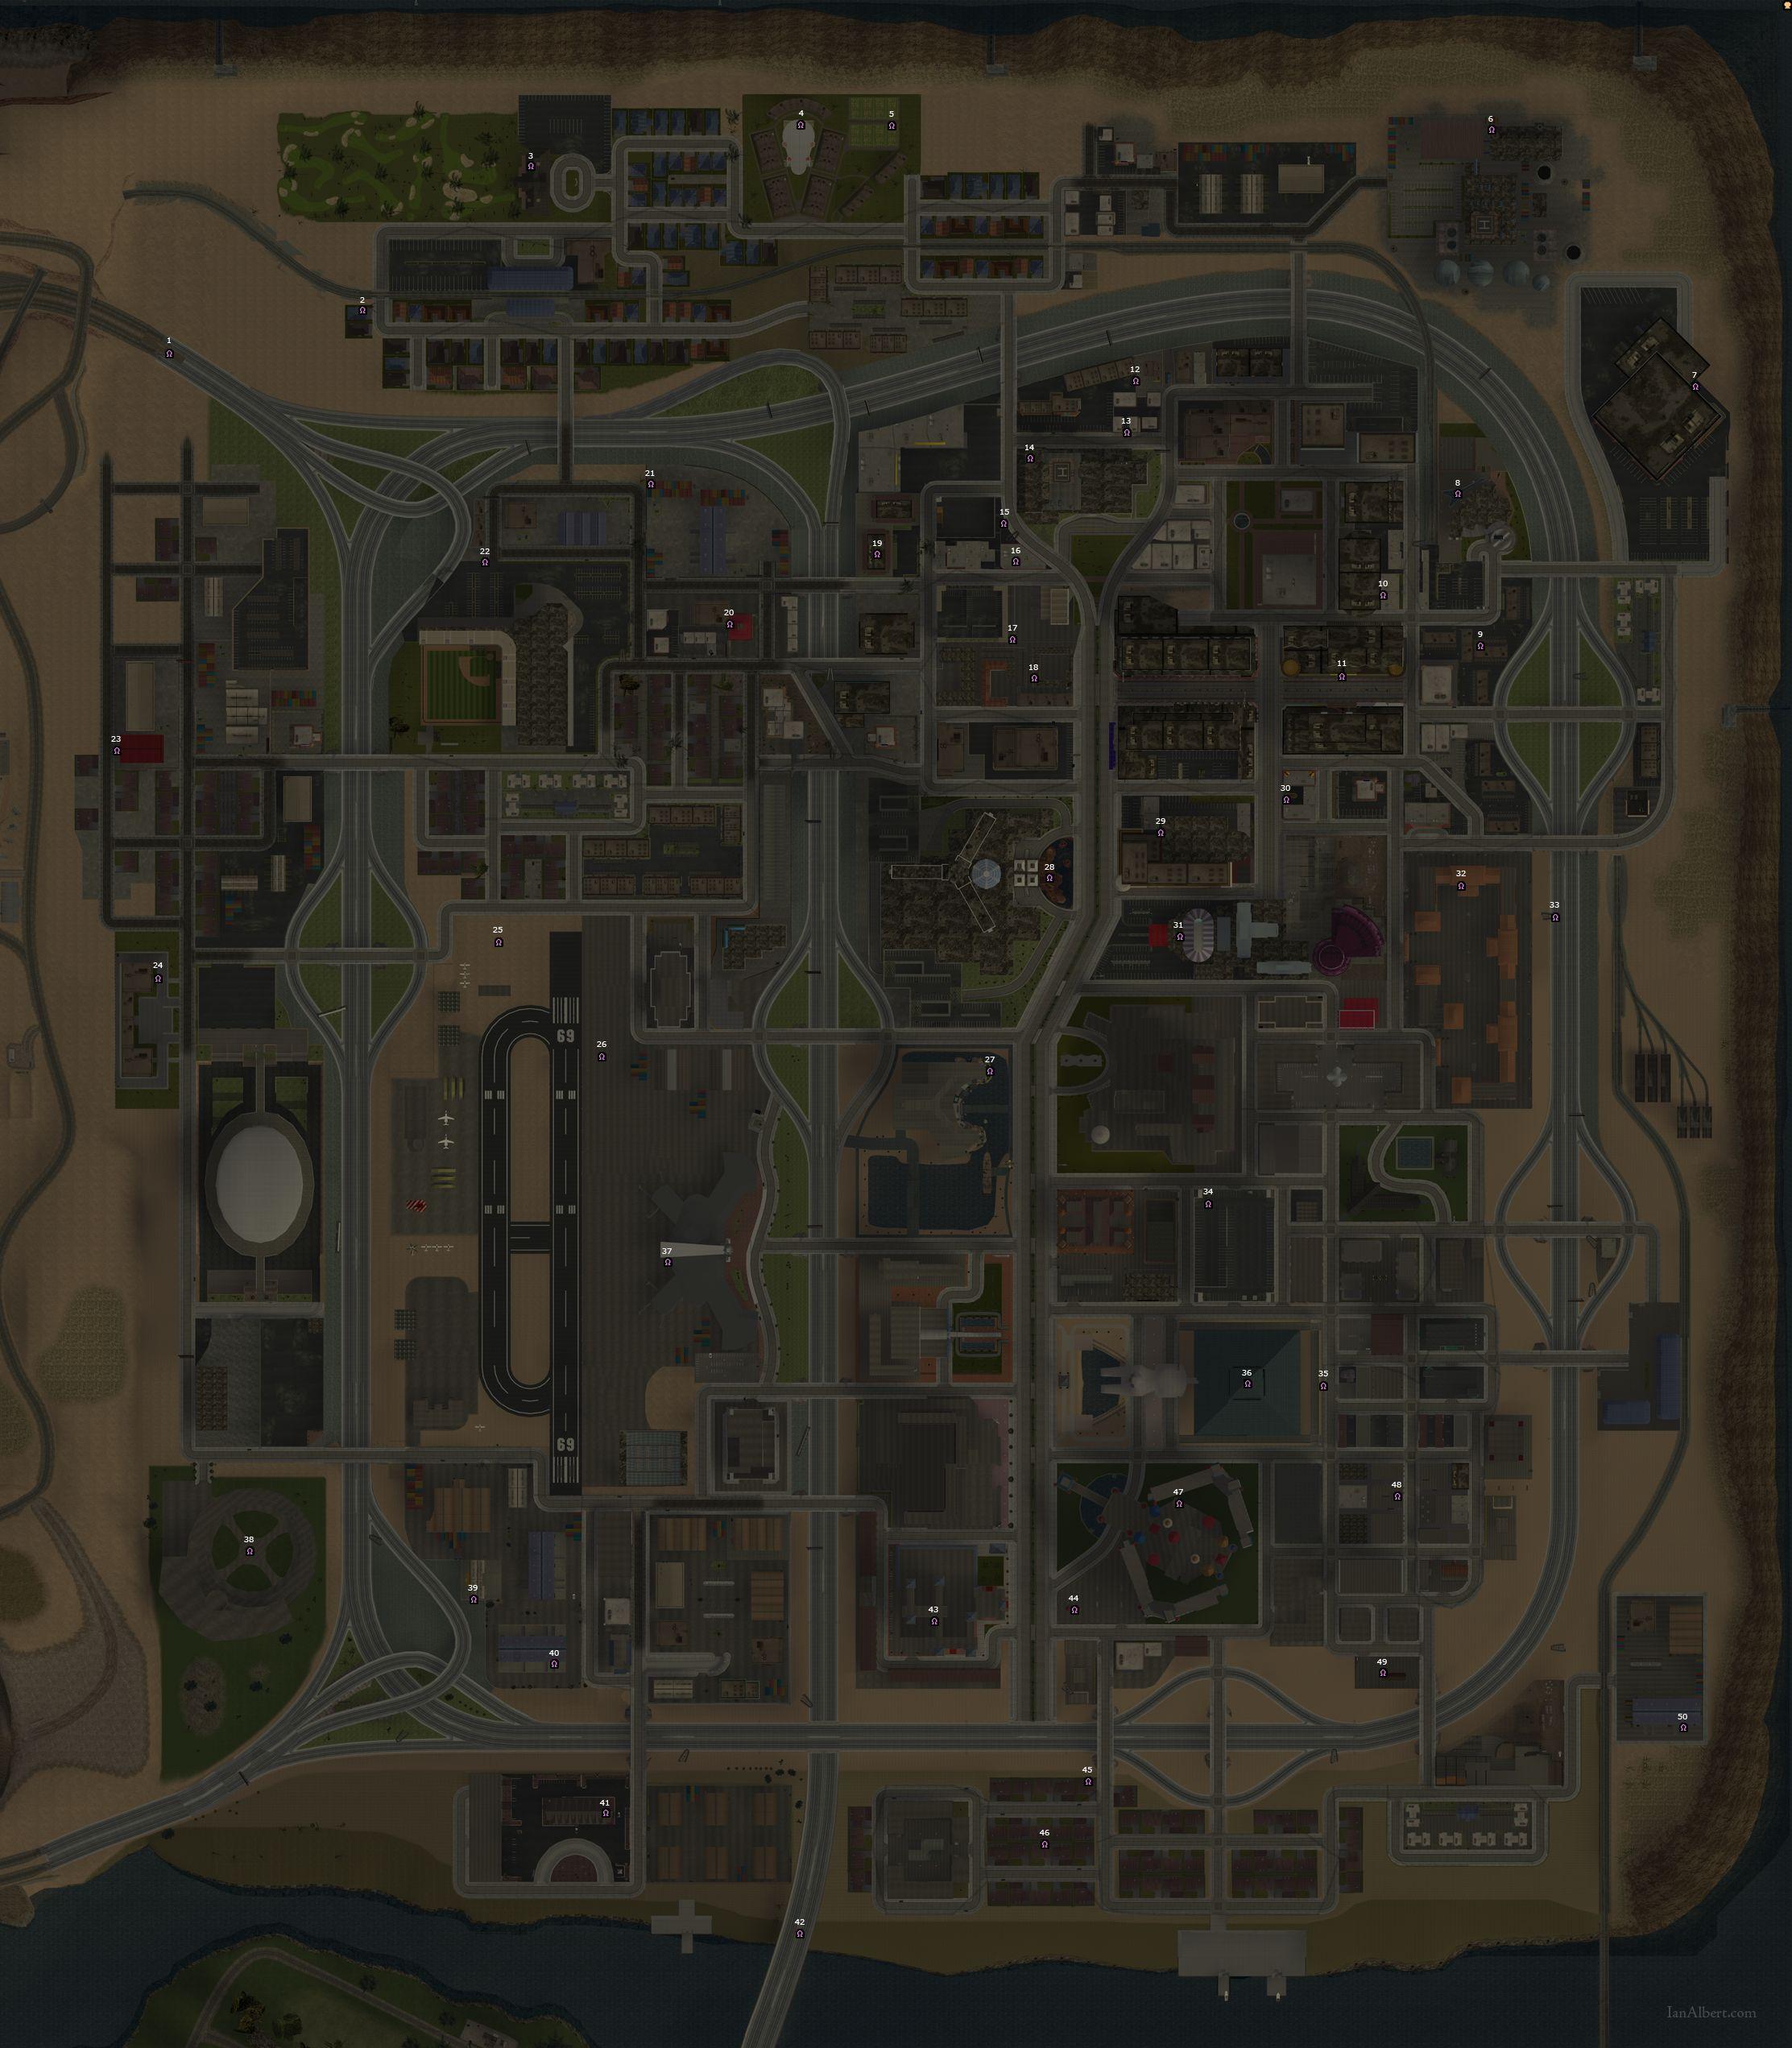 Mazzo Di Fiori Gta San Andreas.Gta Series Com Gta San Andreas Mappe